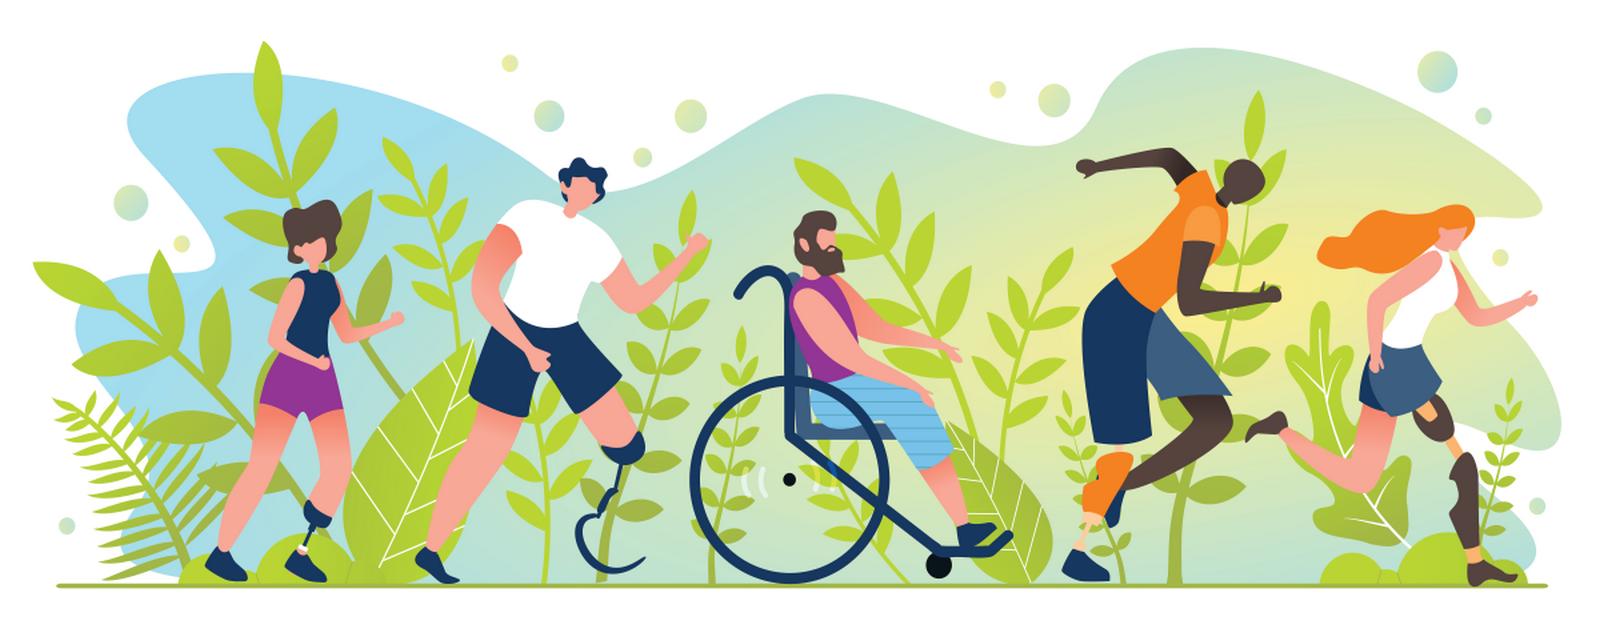 Designing amusement Park for Disabled - Sheet1